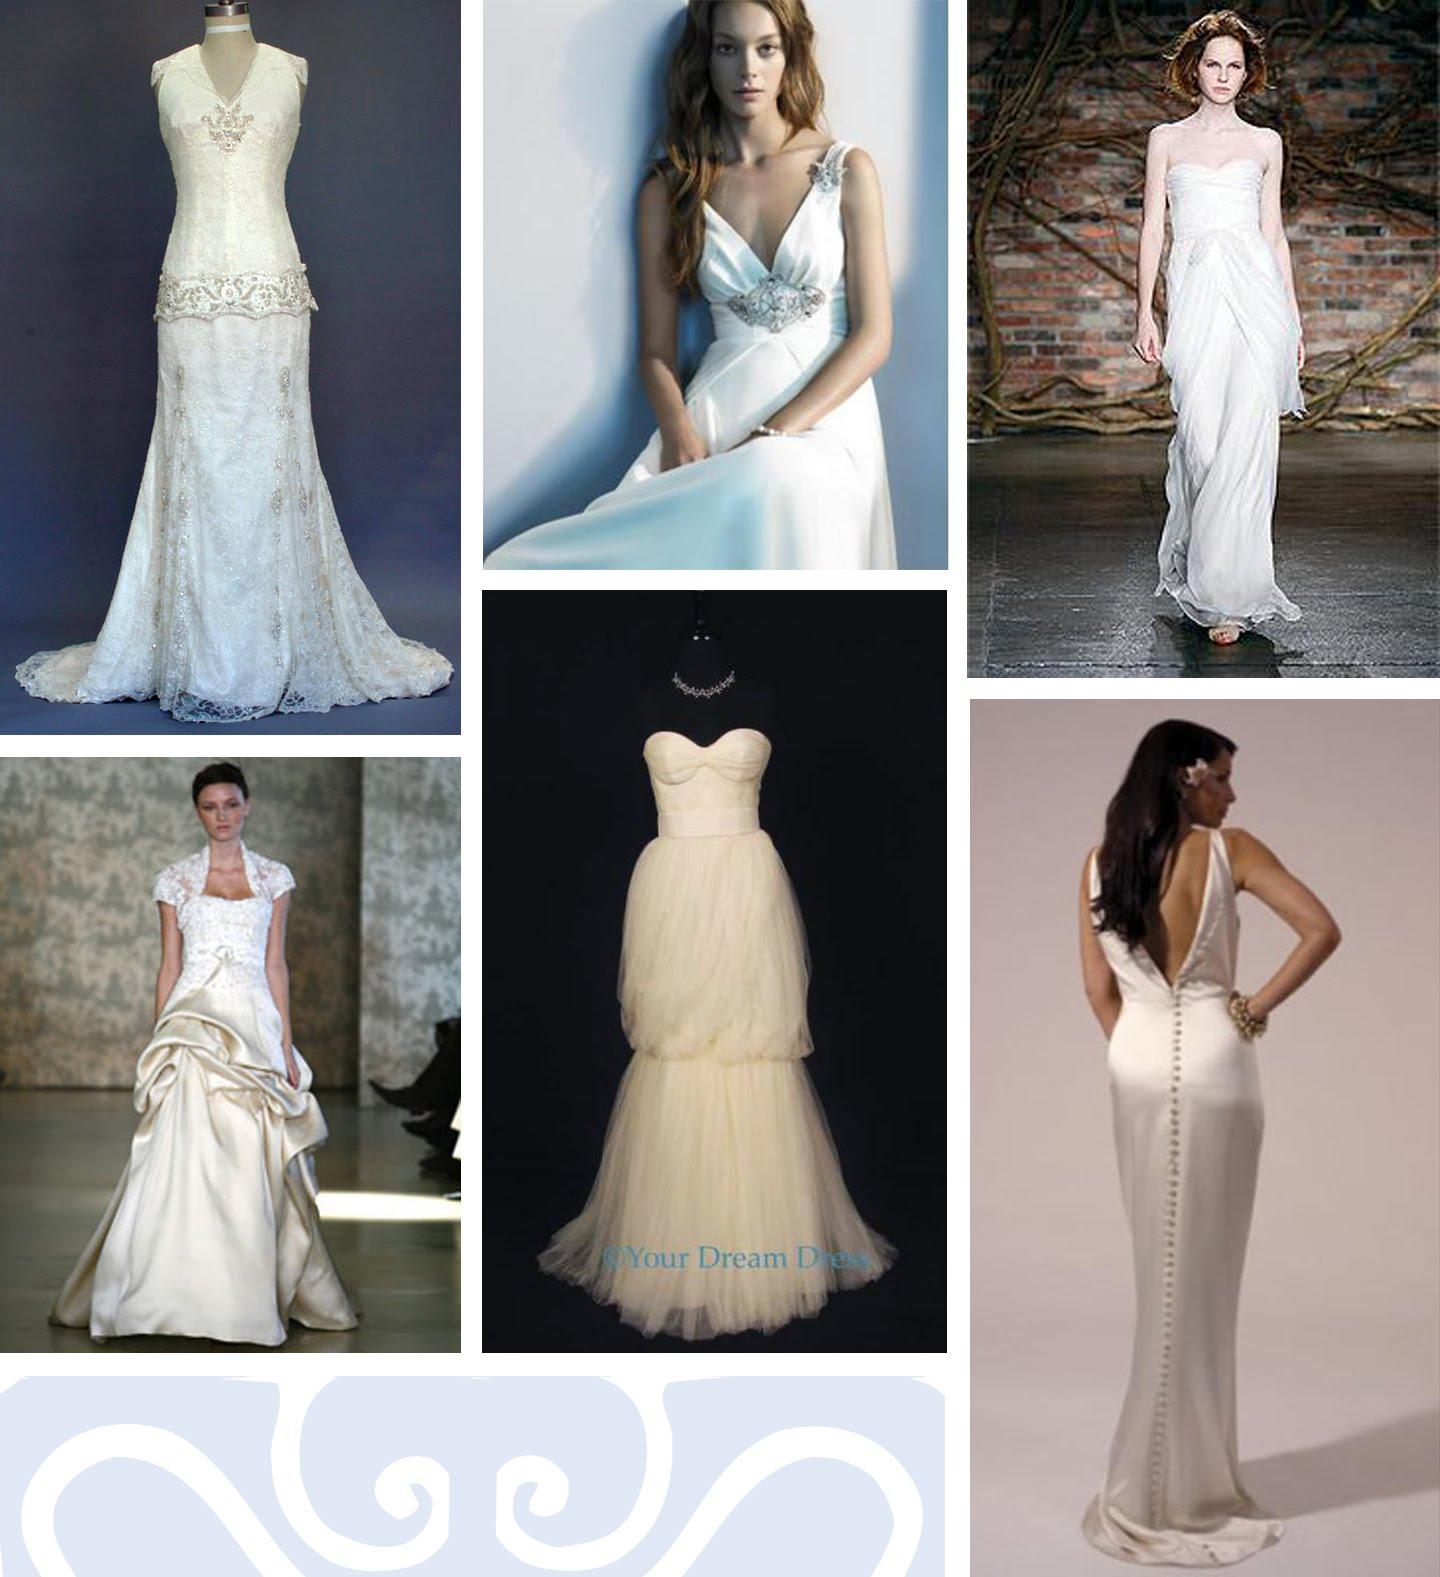 The Artful Bride Wedding Blog: April 2010